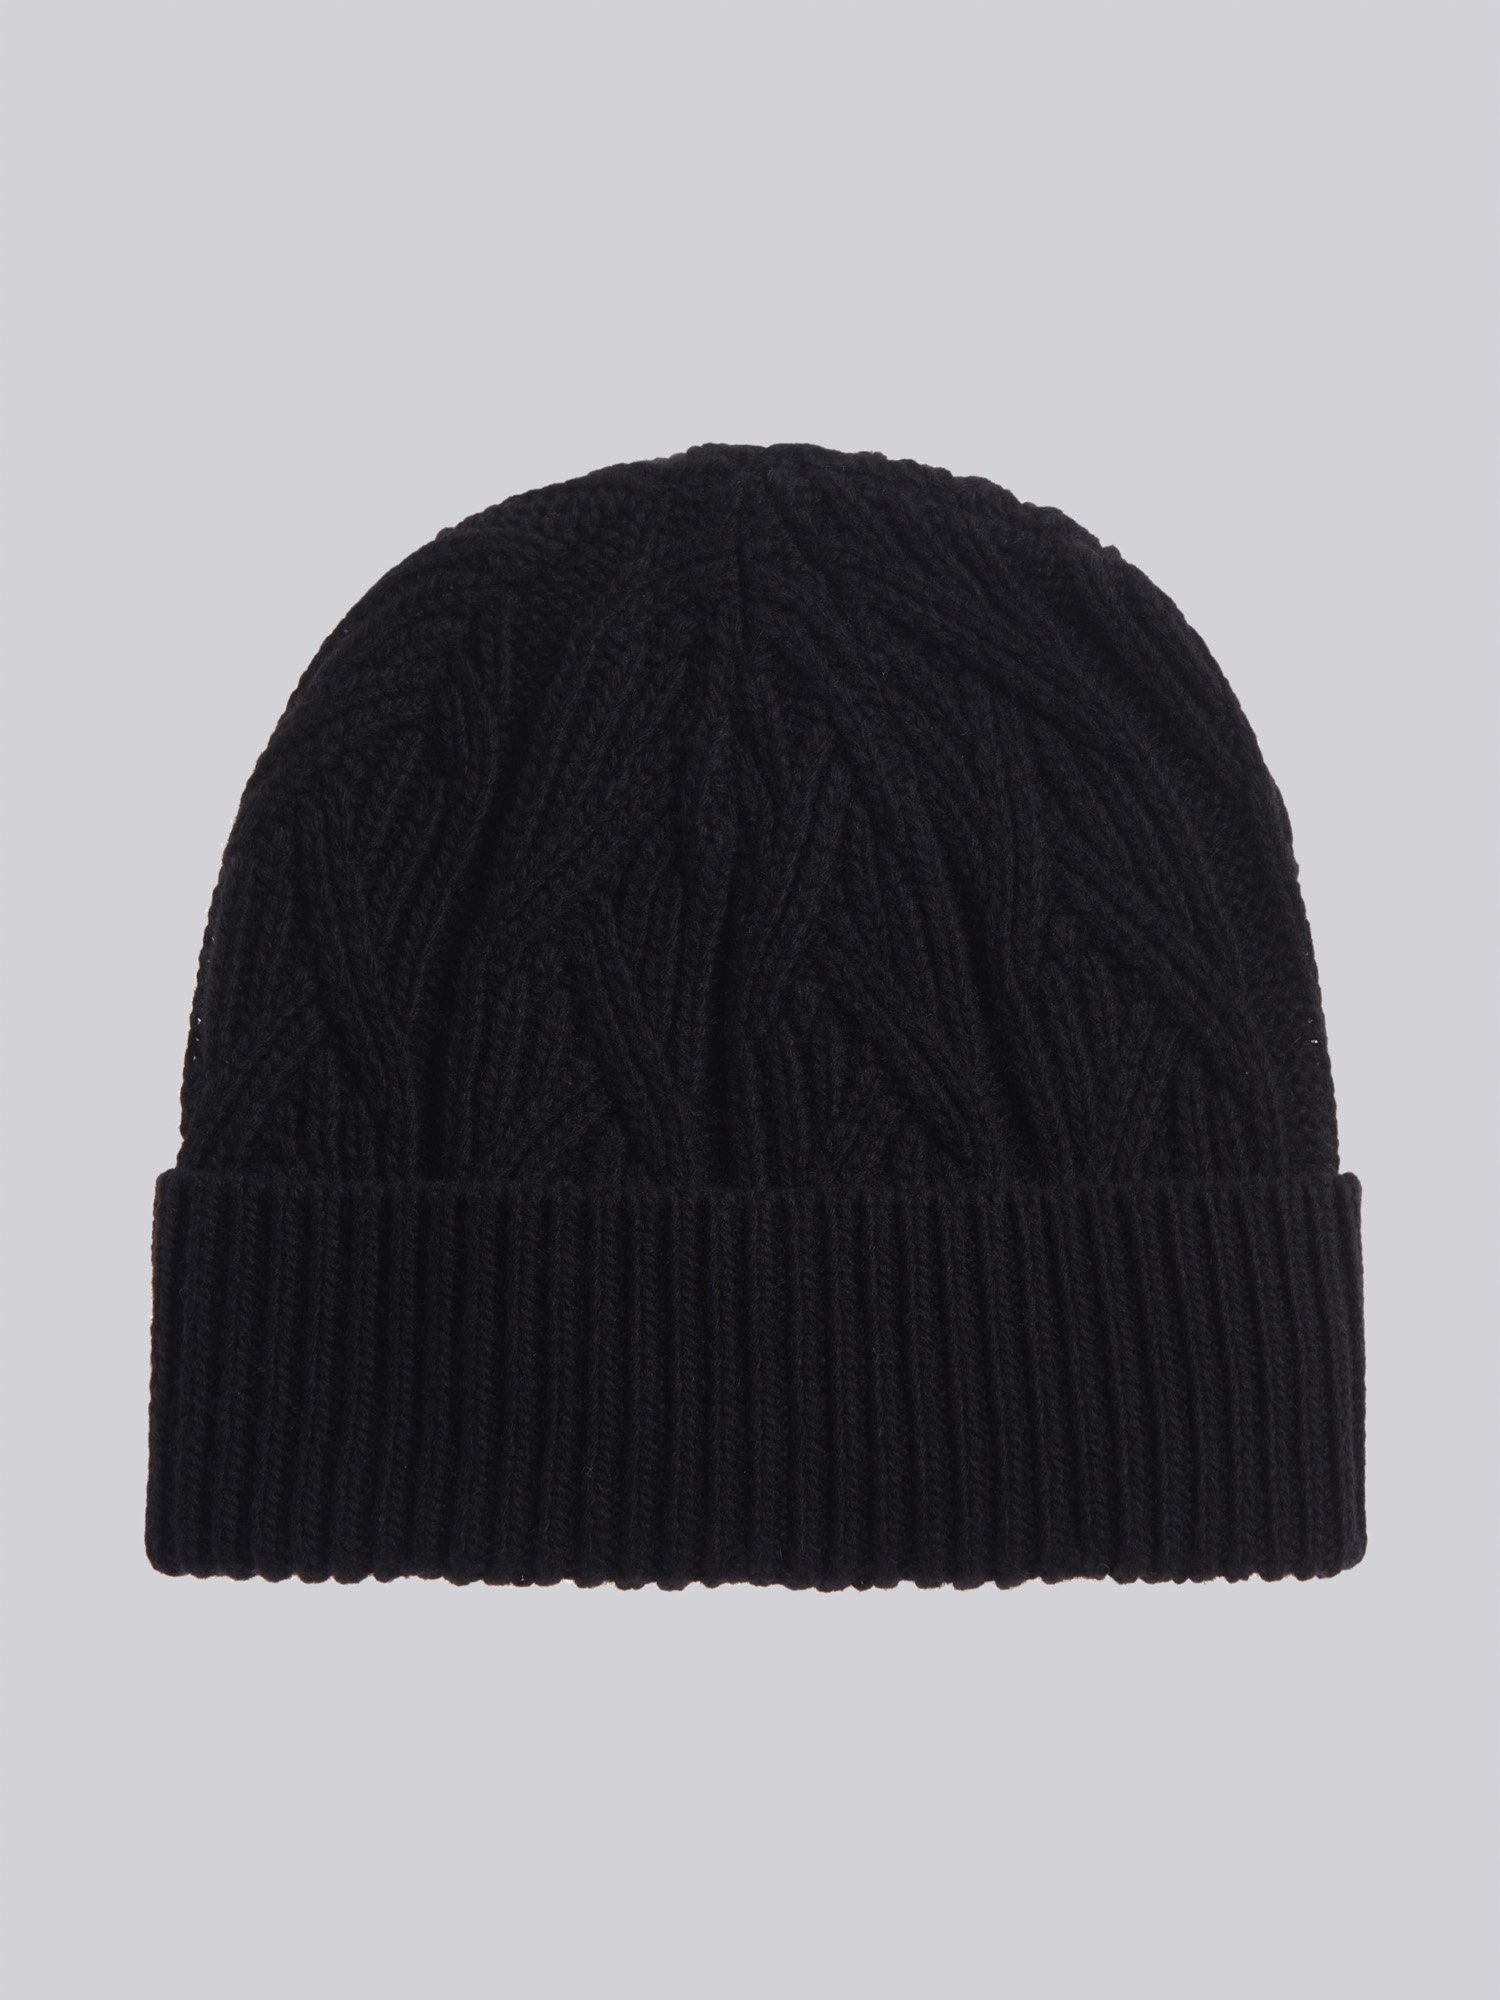 CABLE CAP - Blauer